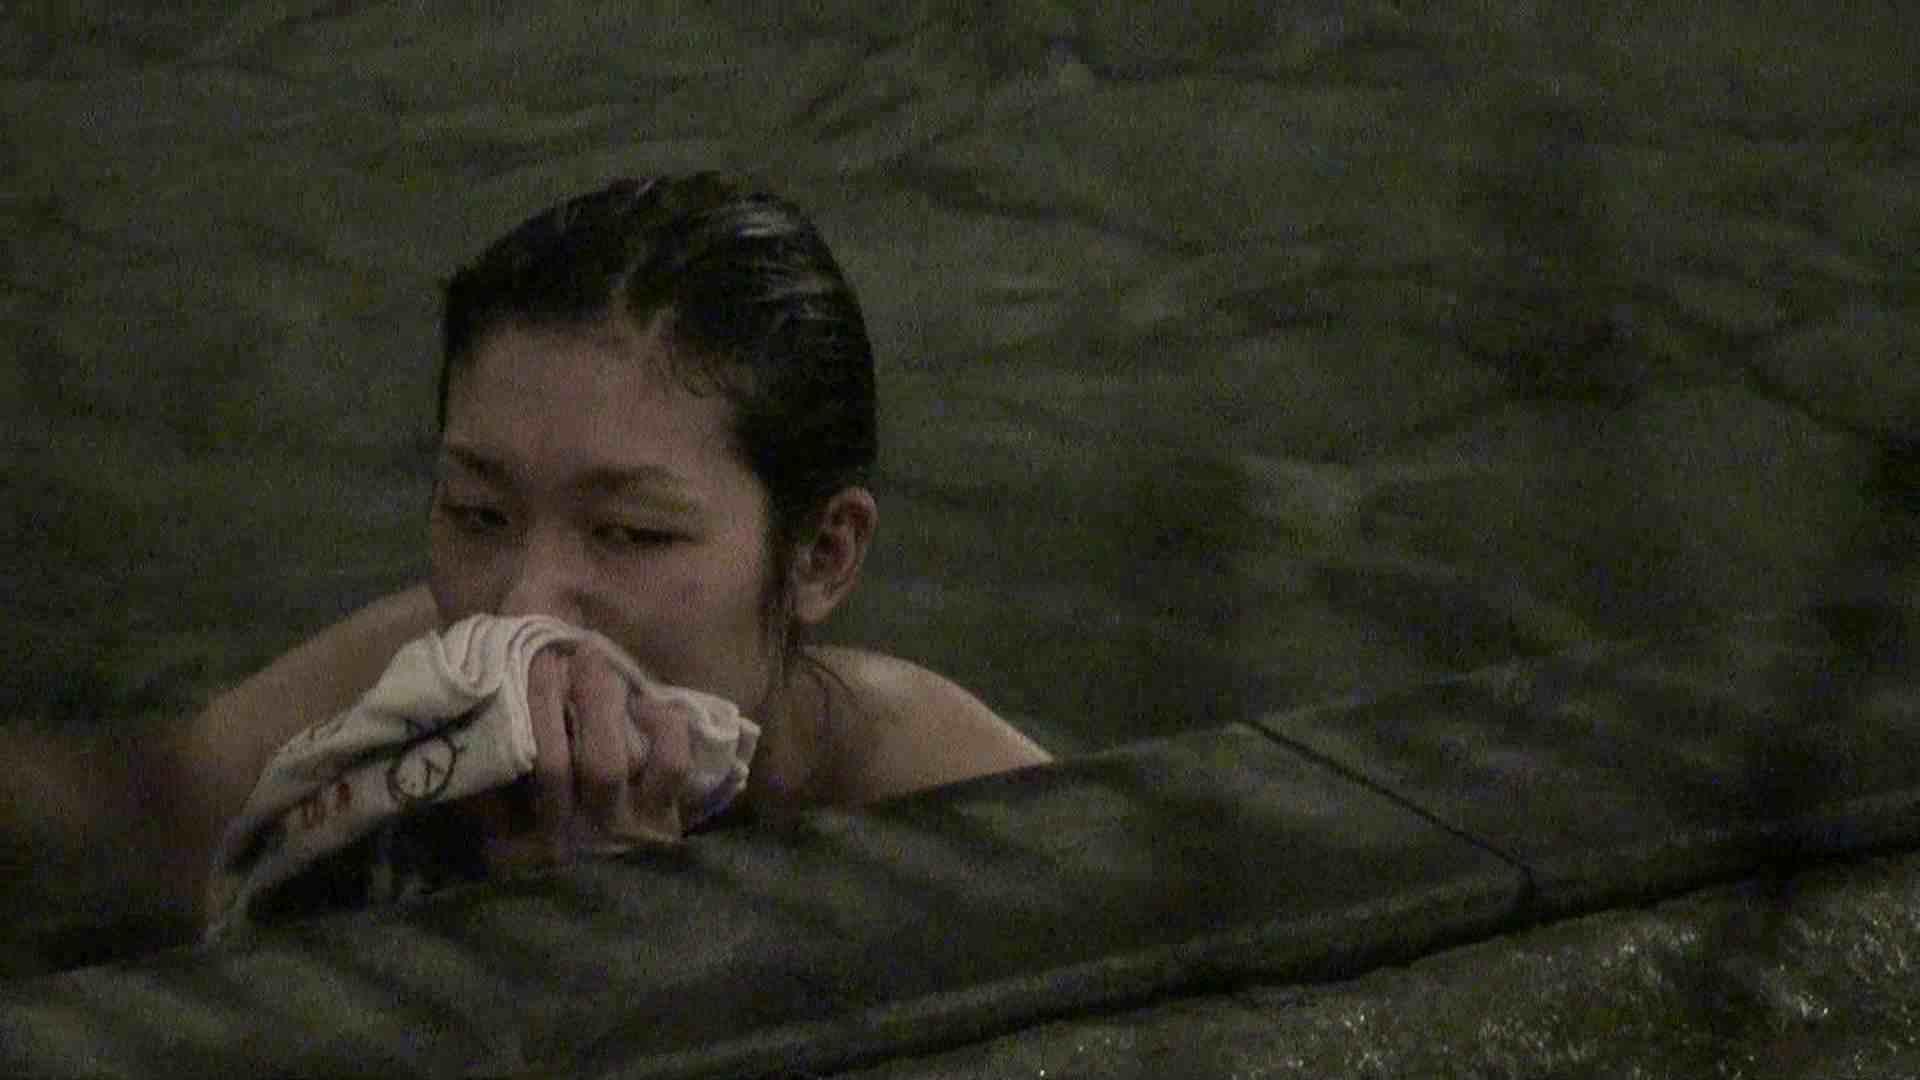 Aquaな露天風呂Vol.399 盗撮シリーズ | 露天風呂編  85PIX 19